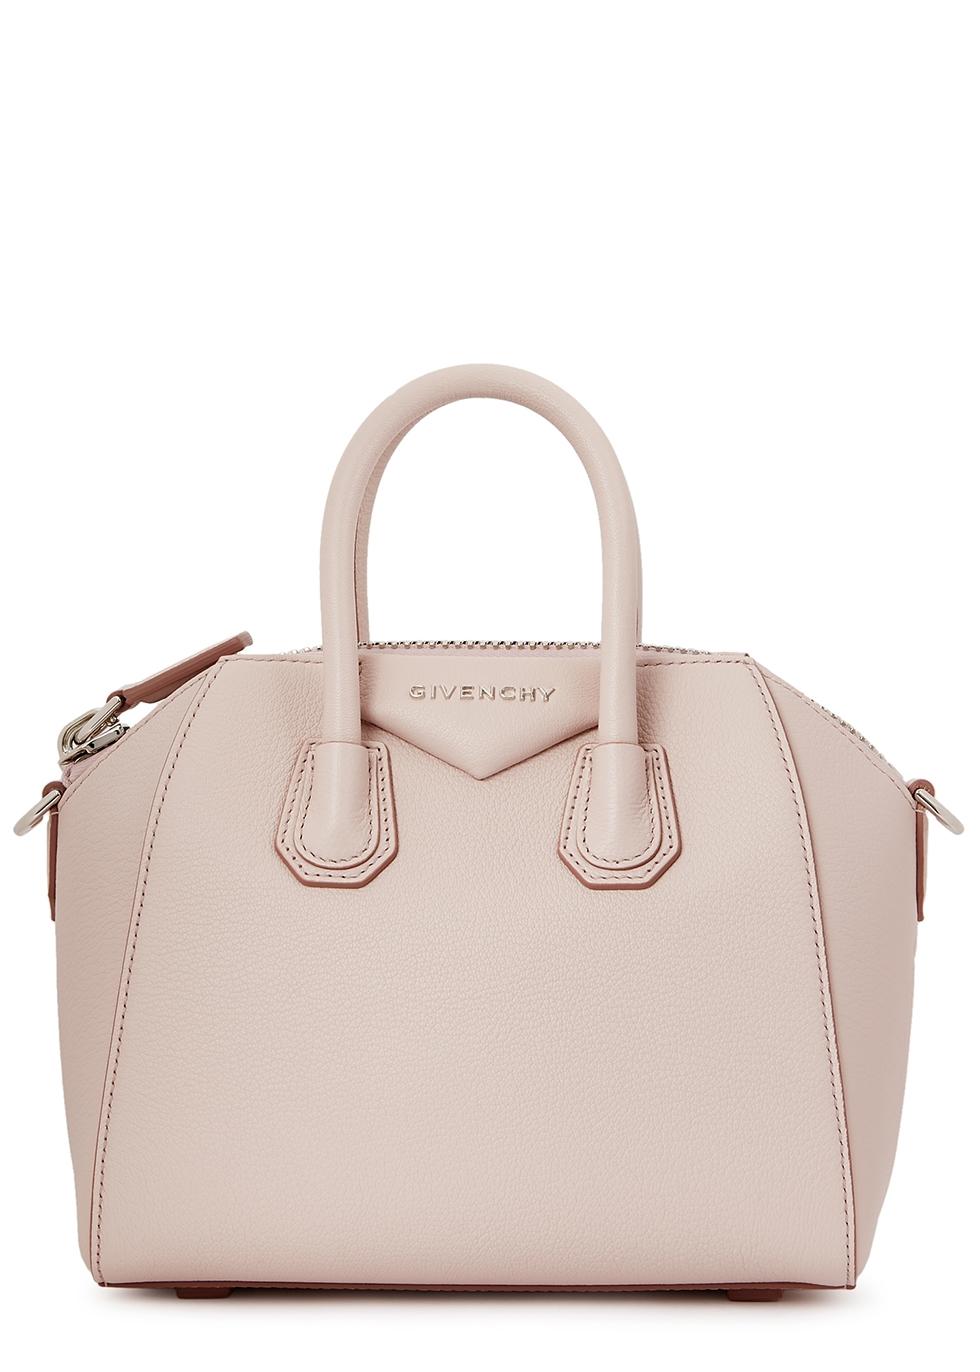 Luggage & Bags Shoulder Bags Loyal Eayin Mini Casual Women Messenger Bags New Femae Handbag Luxury Designer Clutch Ladies Party Purse Famous Designer Shoulder Bags